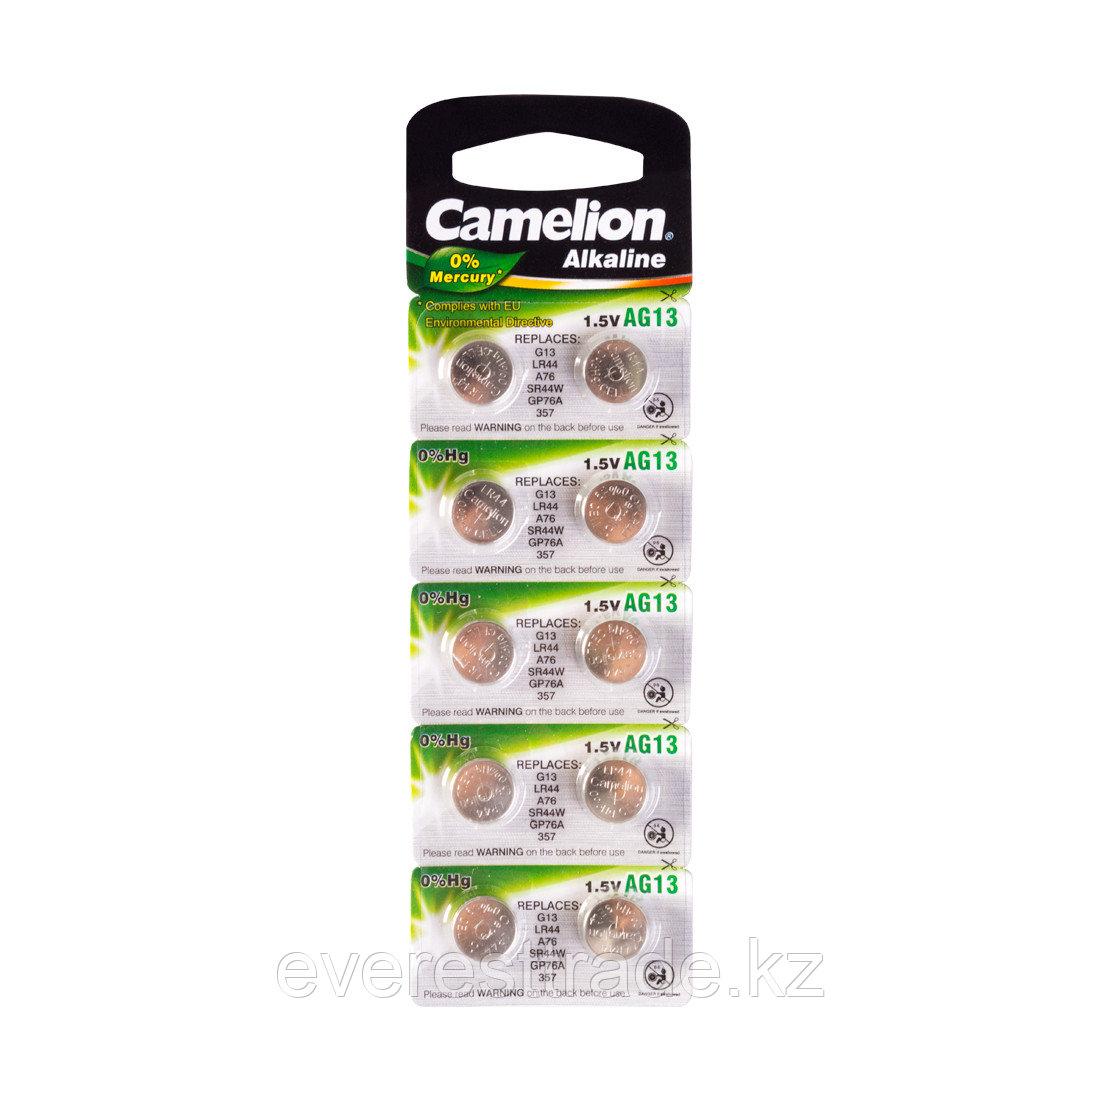 Camelion Батарейки,CAMELION, AG13-BP10, Alkaline, AG13, 1.5V, 0% Ртути, 10 шт., Блистер